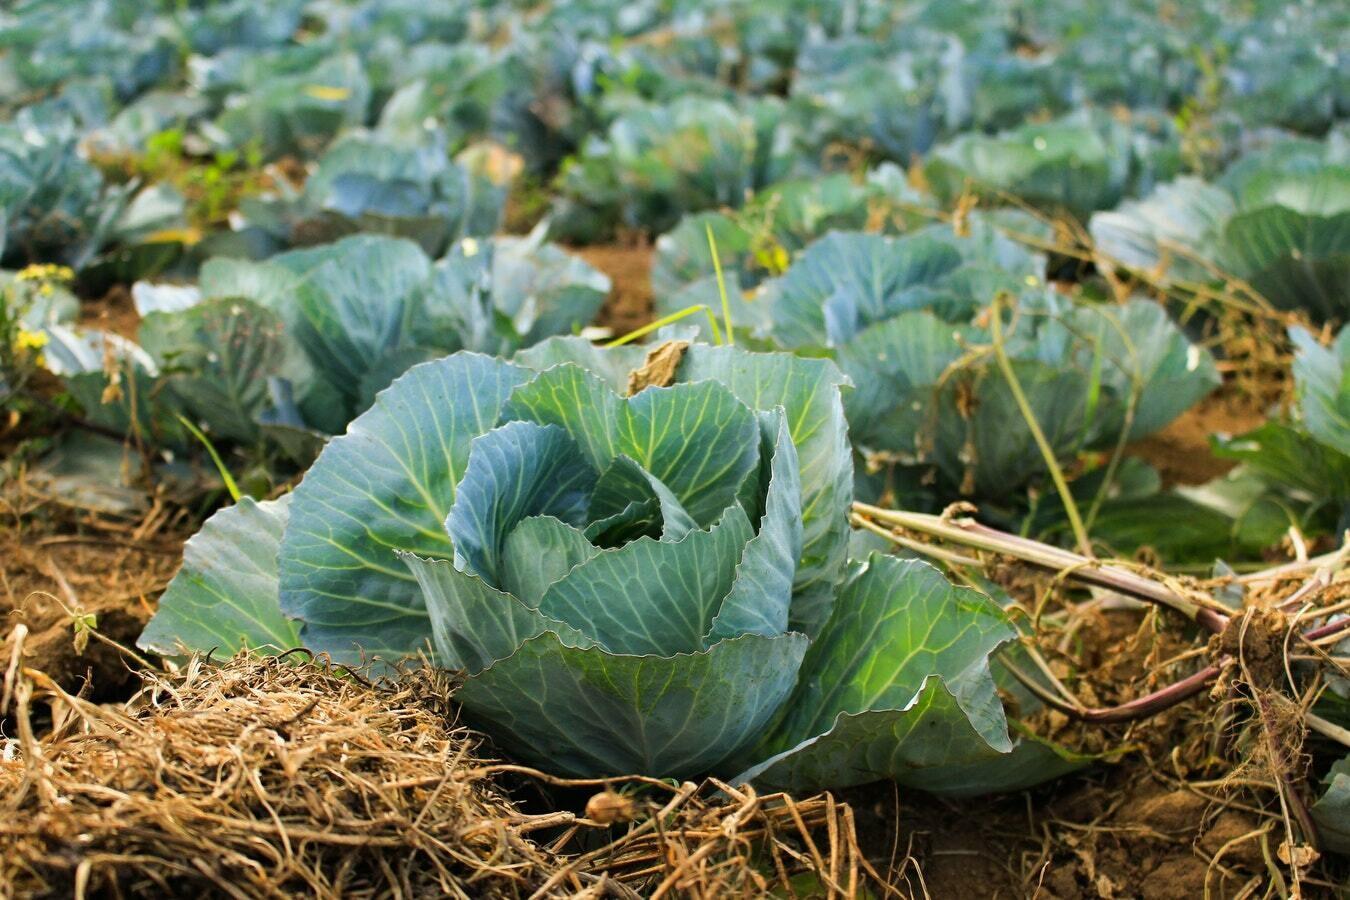 Cabbages - Summer - British